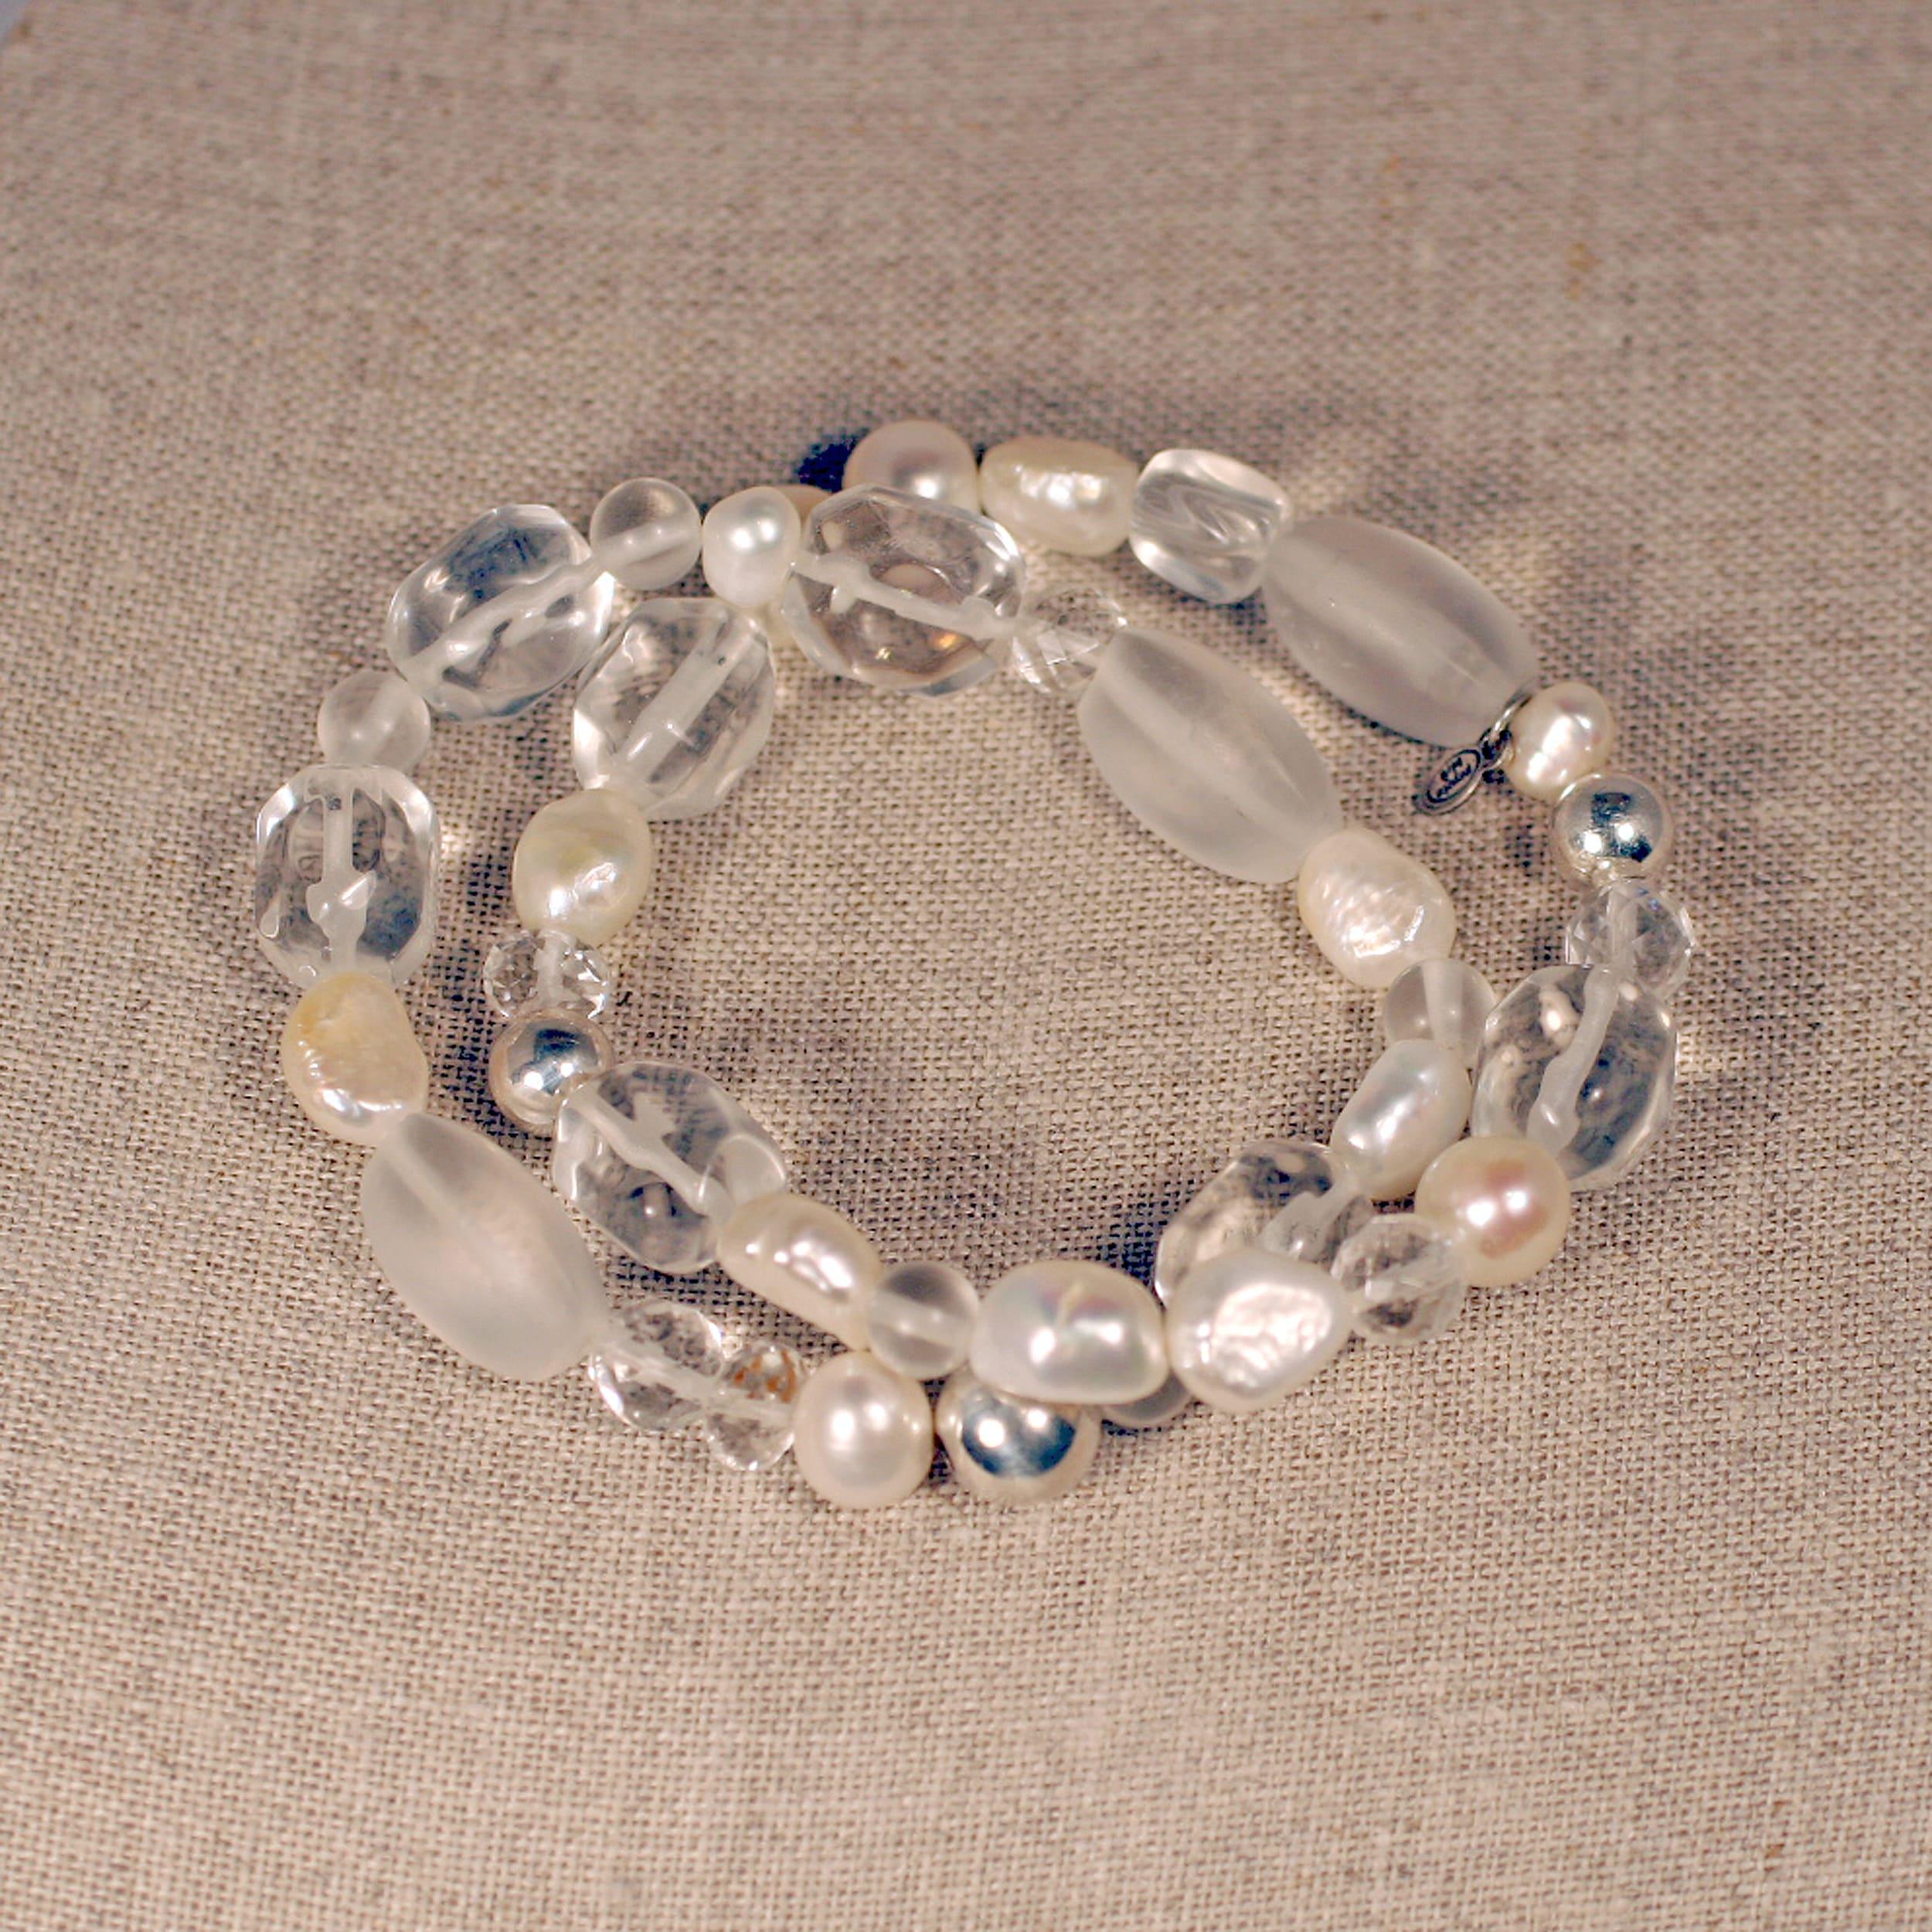 Peyote Bird Designs Silver Pearl and Quartz Stretch Bracelet (7-9 mm)(China)